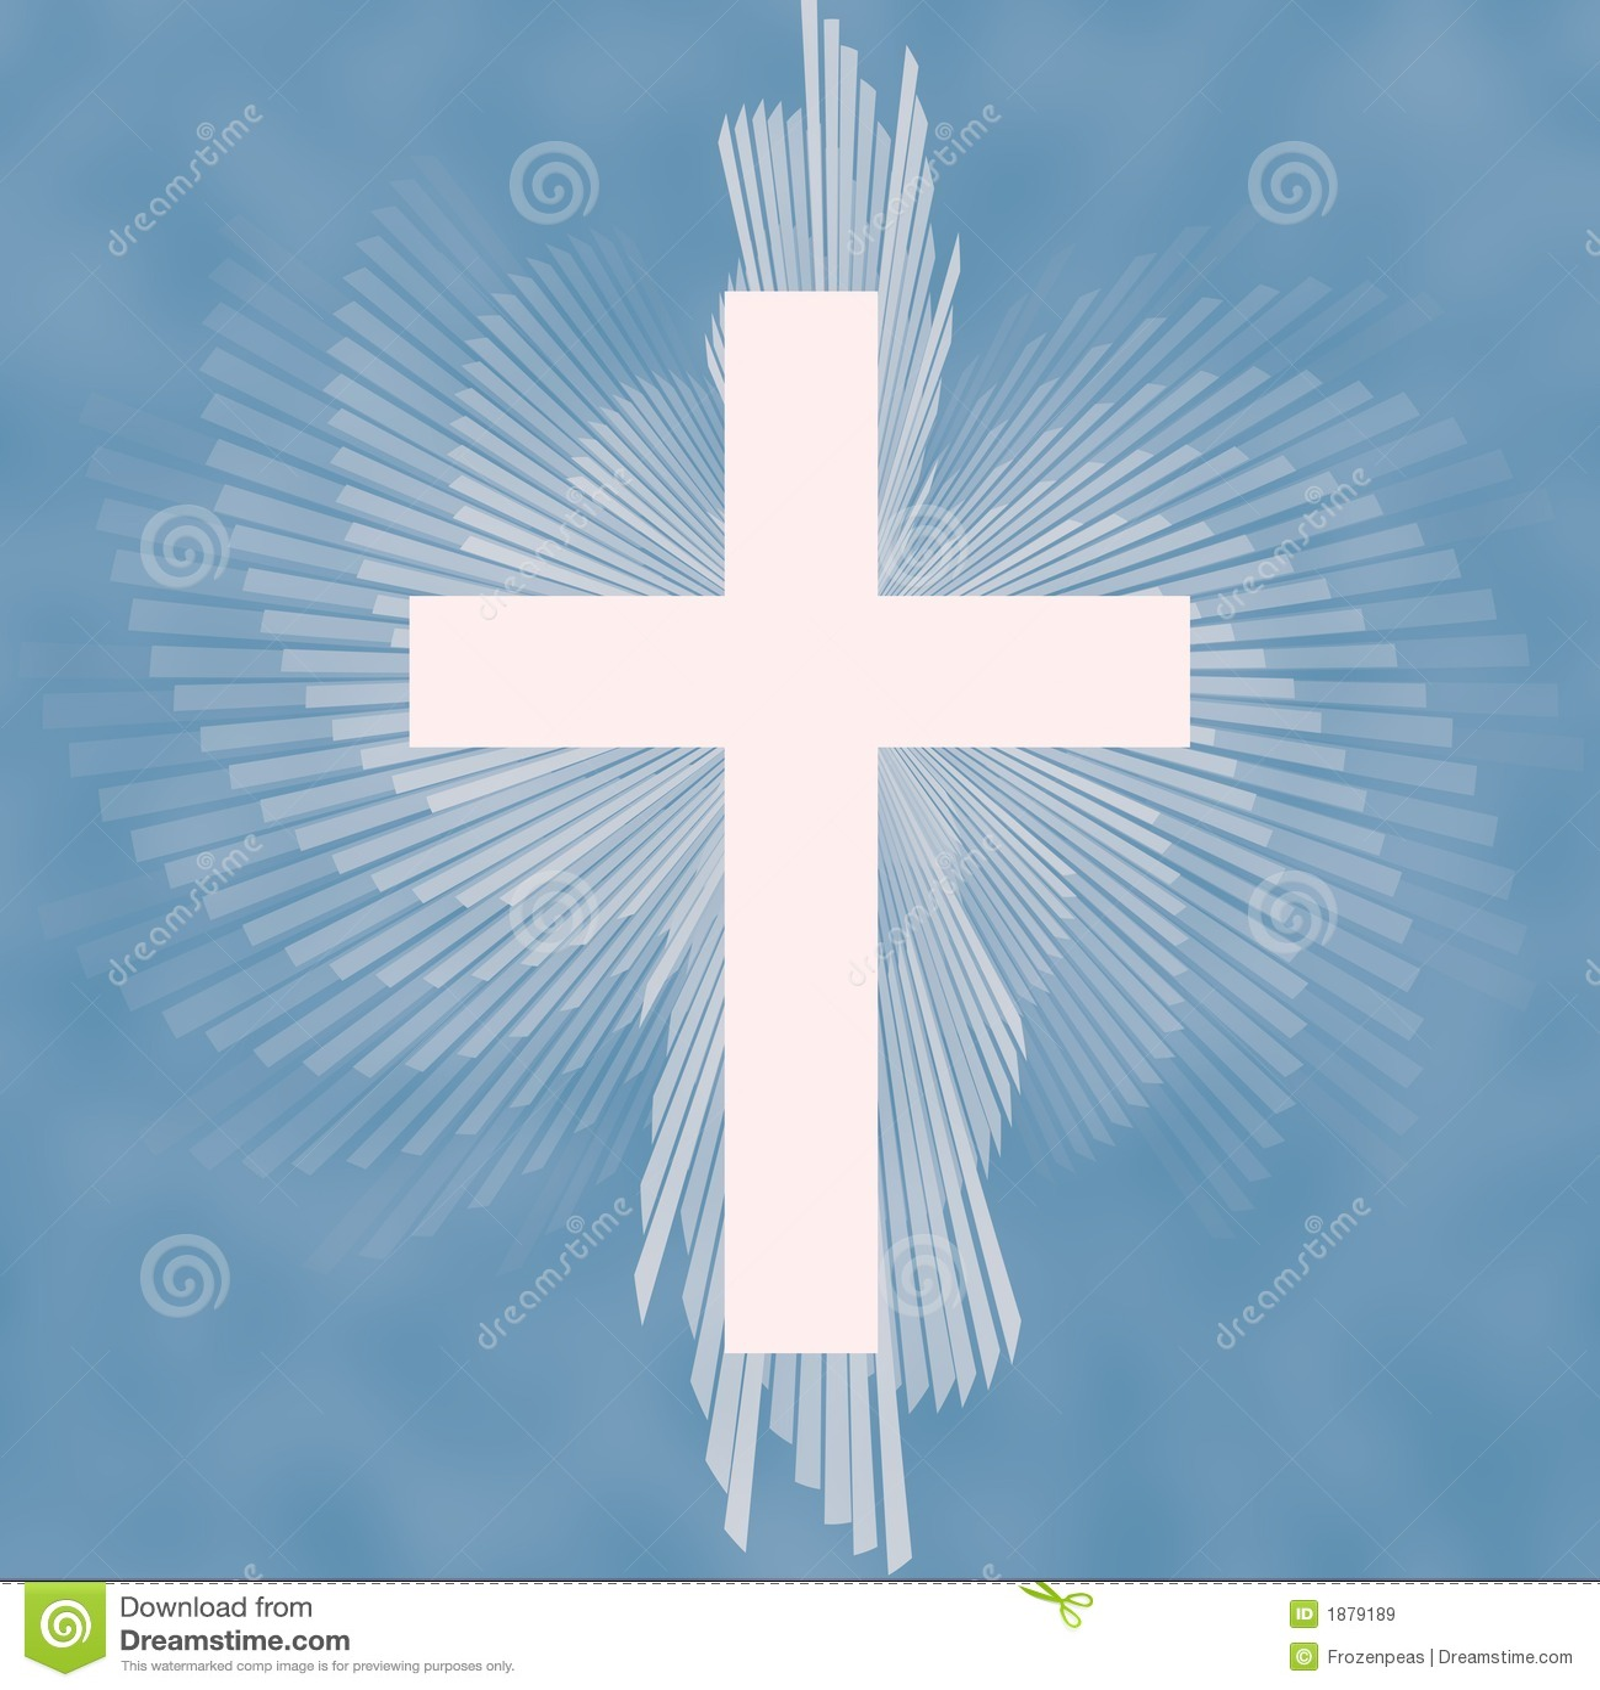 Cross Wallpapers Free: Cross Background. Stock Illustration. Illustration Of